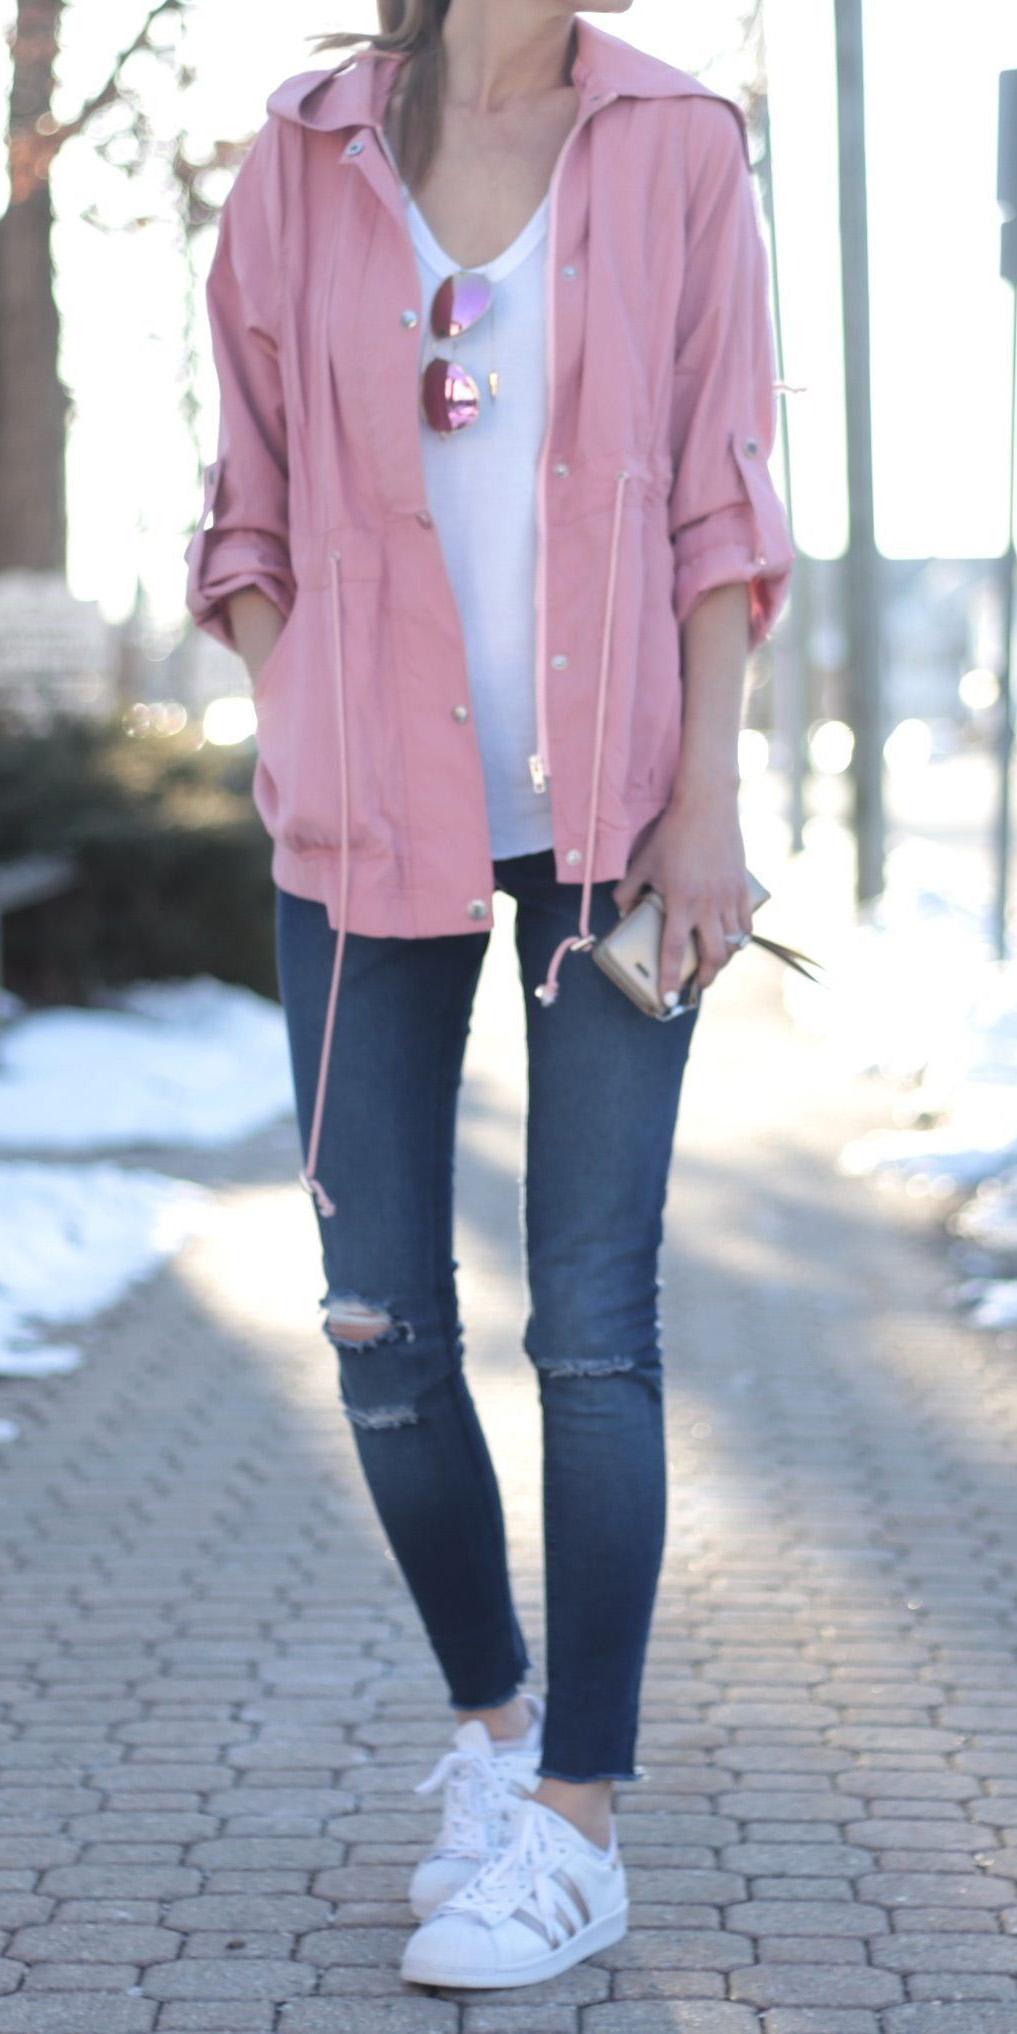 blue-navy-skinny-jeans-white-tee-pink-light-jacket-utility-sun-white-shoe-sneakers-spring-summer-weekend.jpg